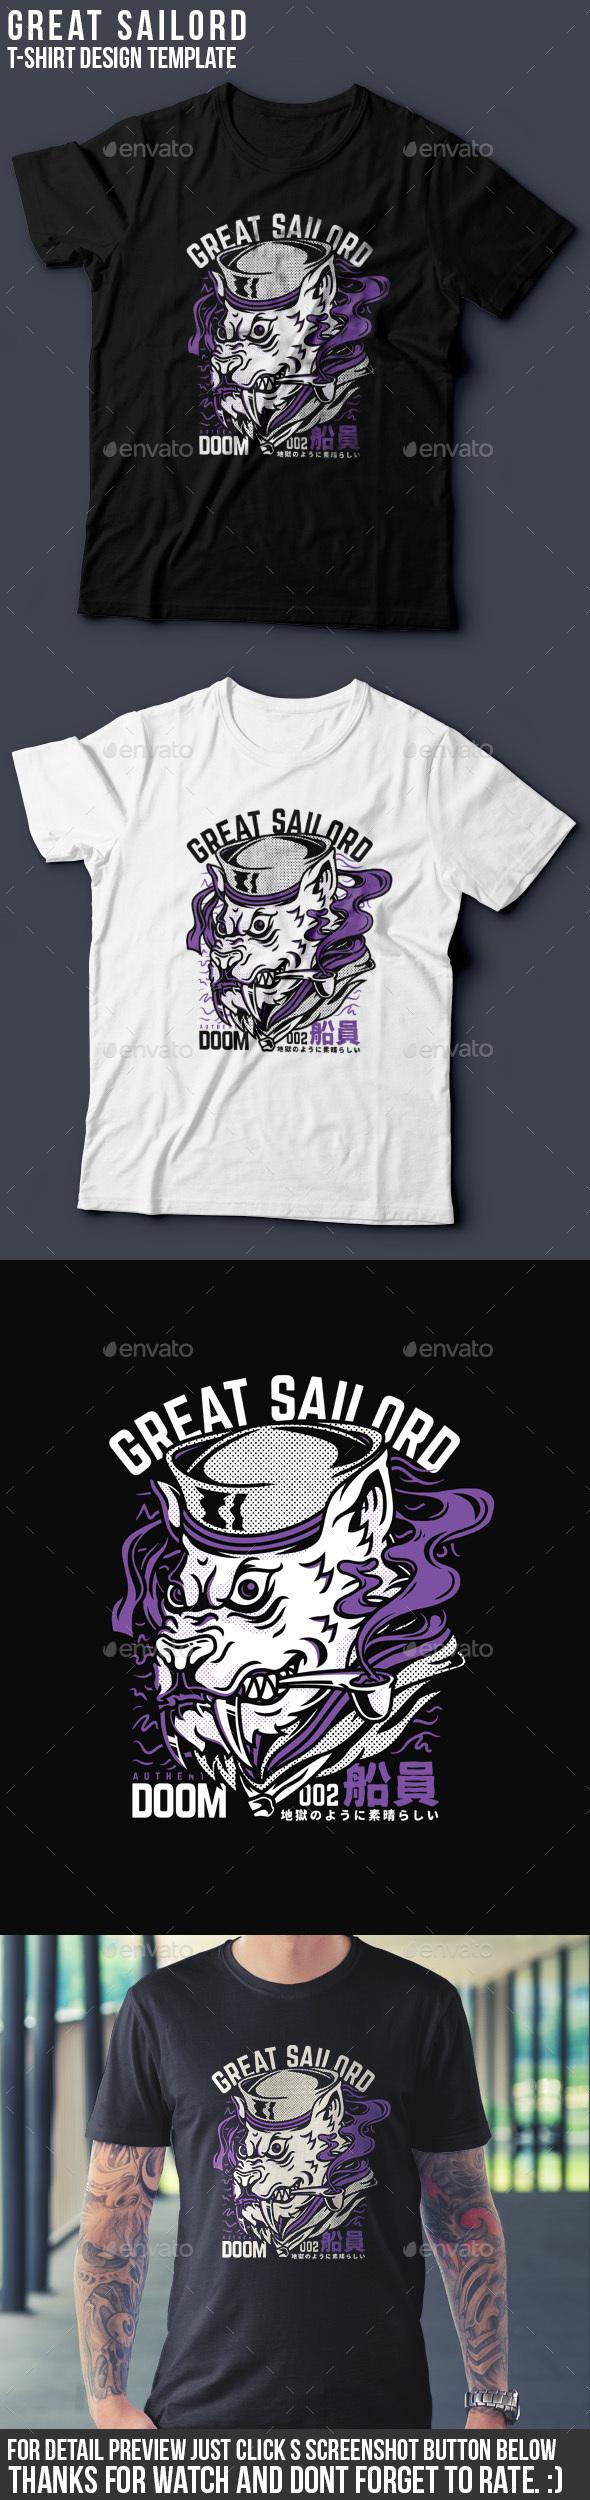 Great Sailord T-Shirt Design - Grunge Designs